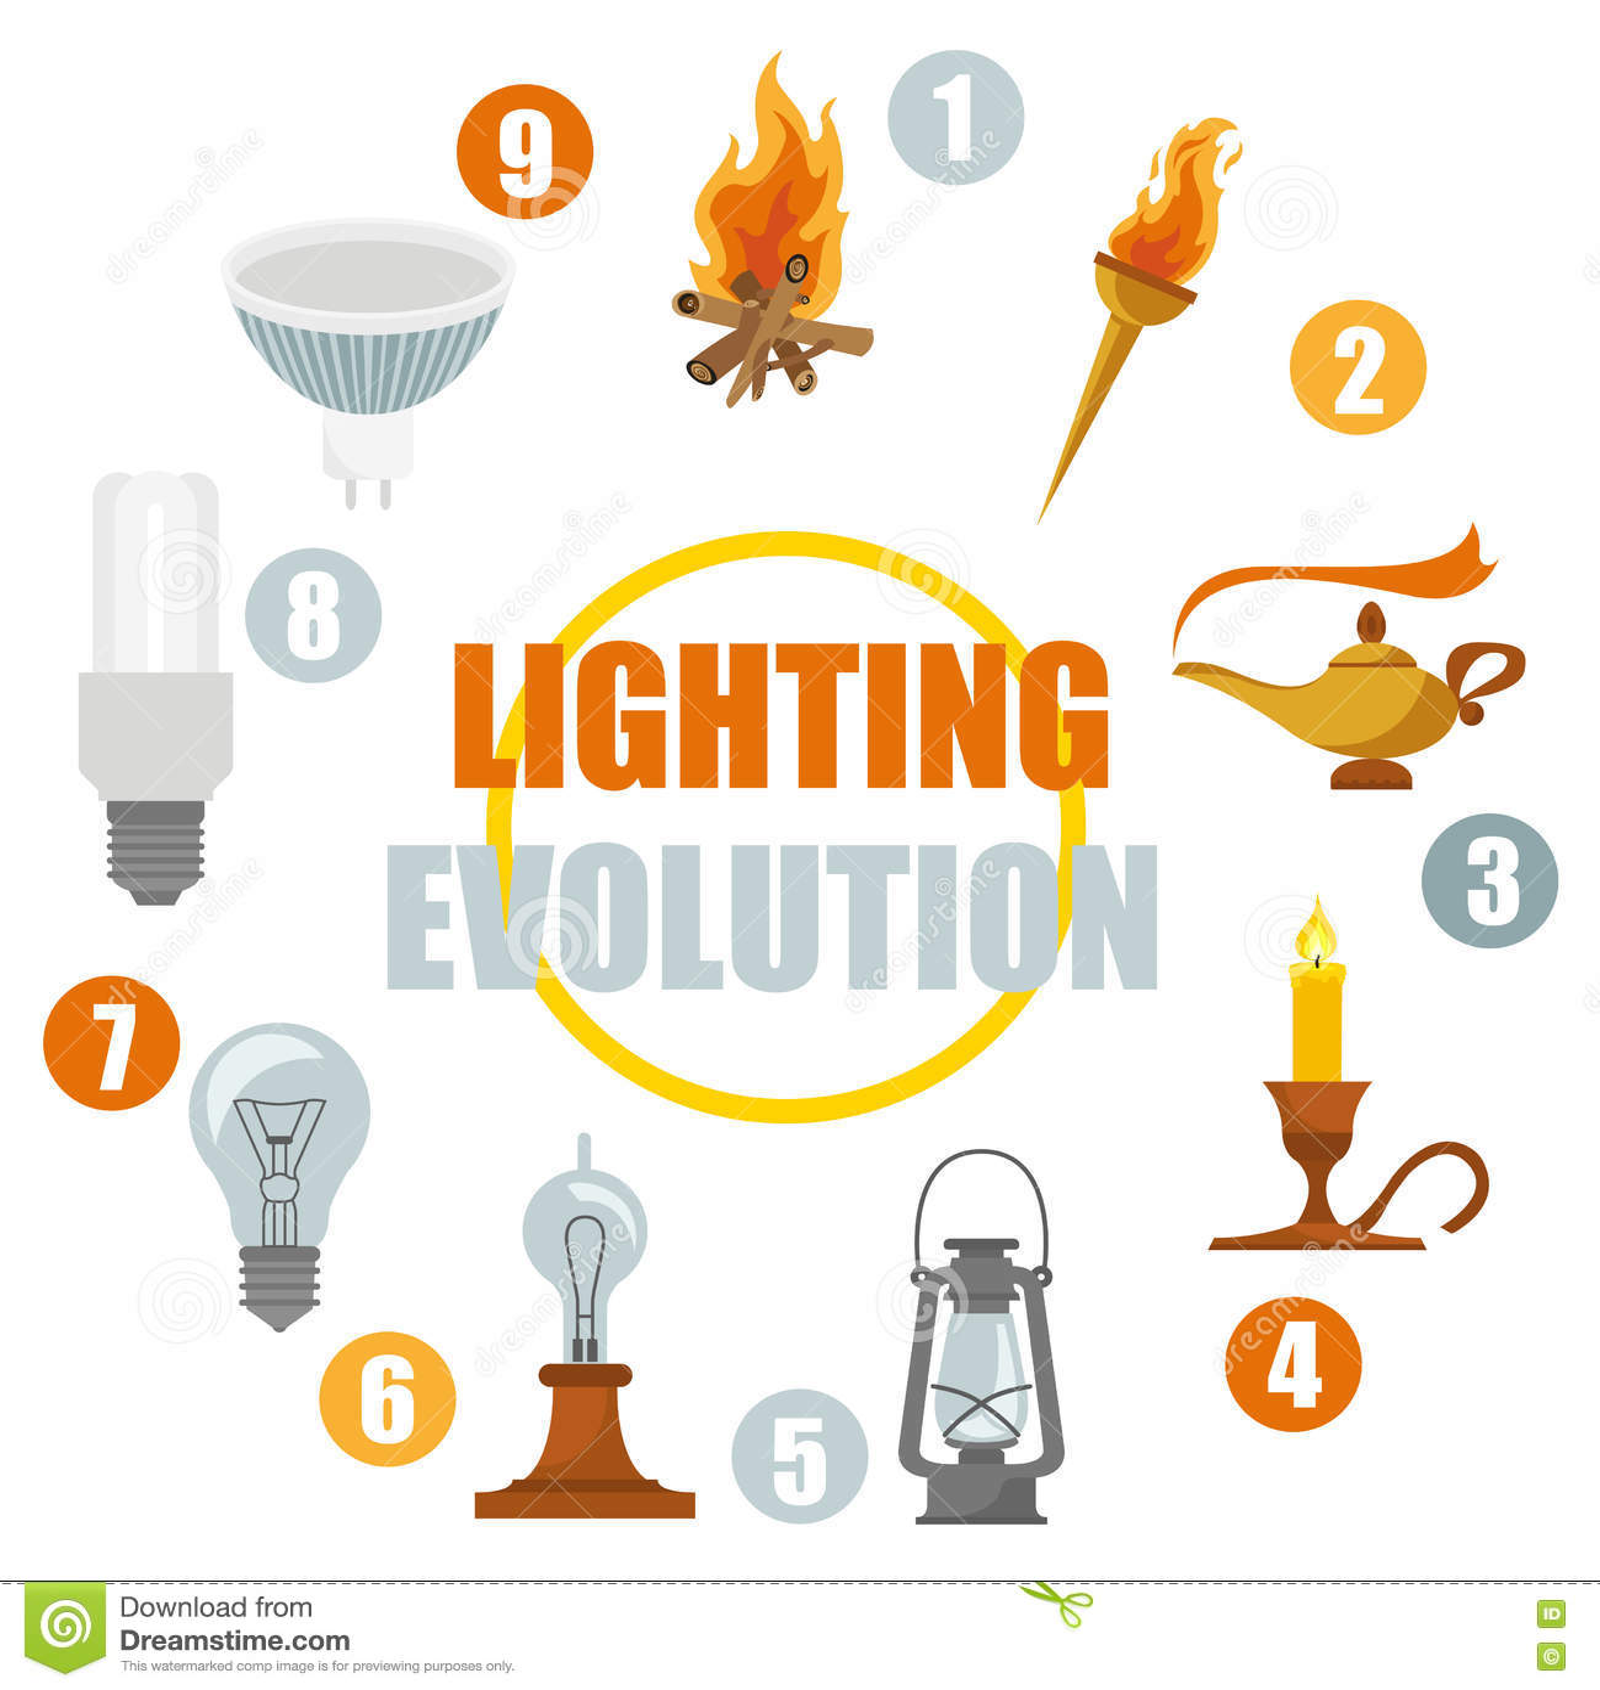 Lighting elements icon set. Evolution of light  sc 1 st  Dreamstime.com & Lighting Elements Icon Set. Evolution Of Light Stock Vector ... azcodes.com